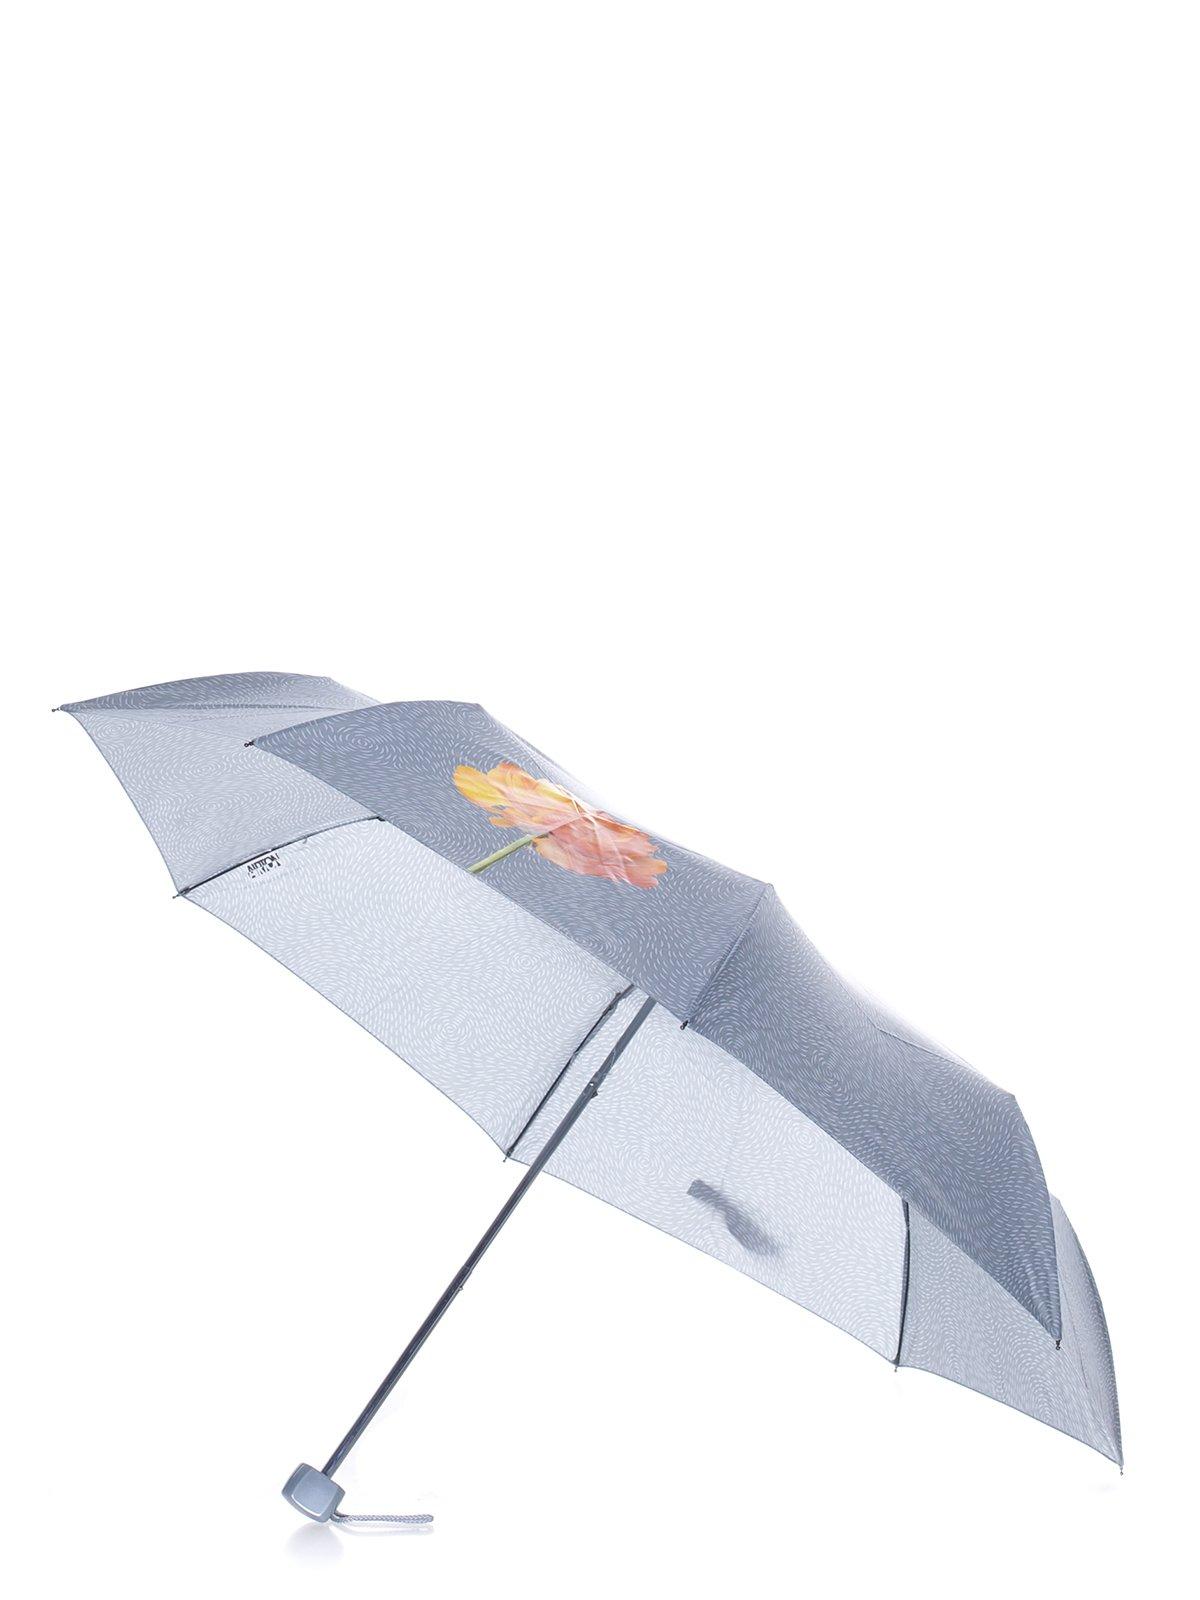 Зонт | 3296665 | фото 2